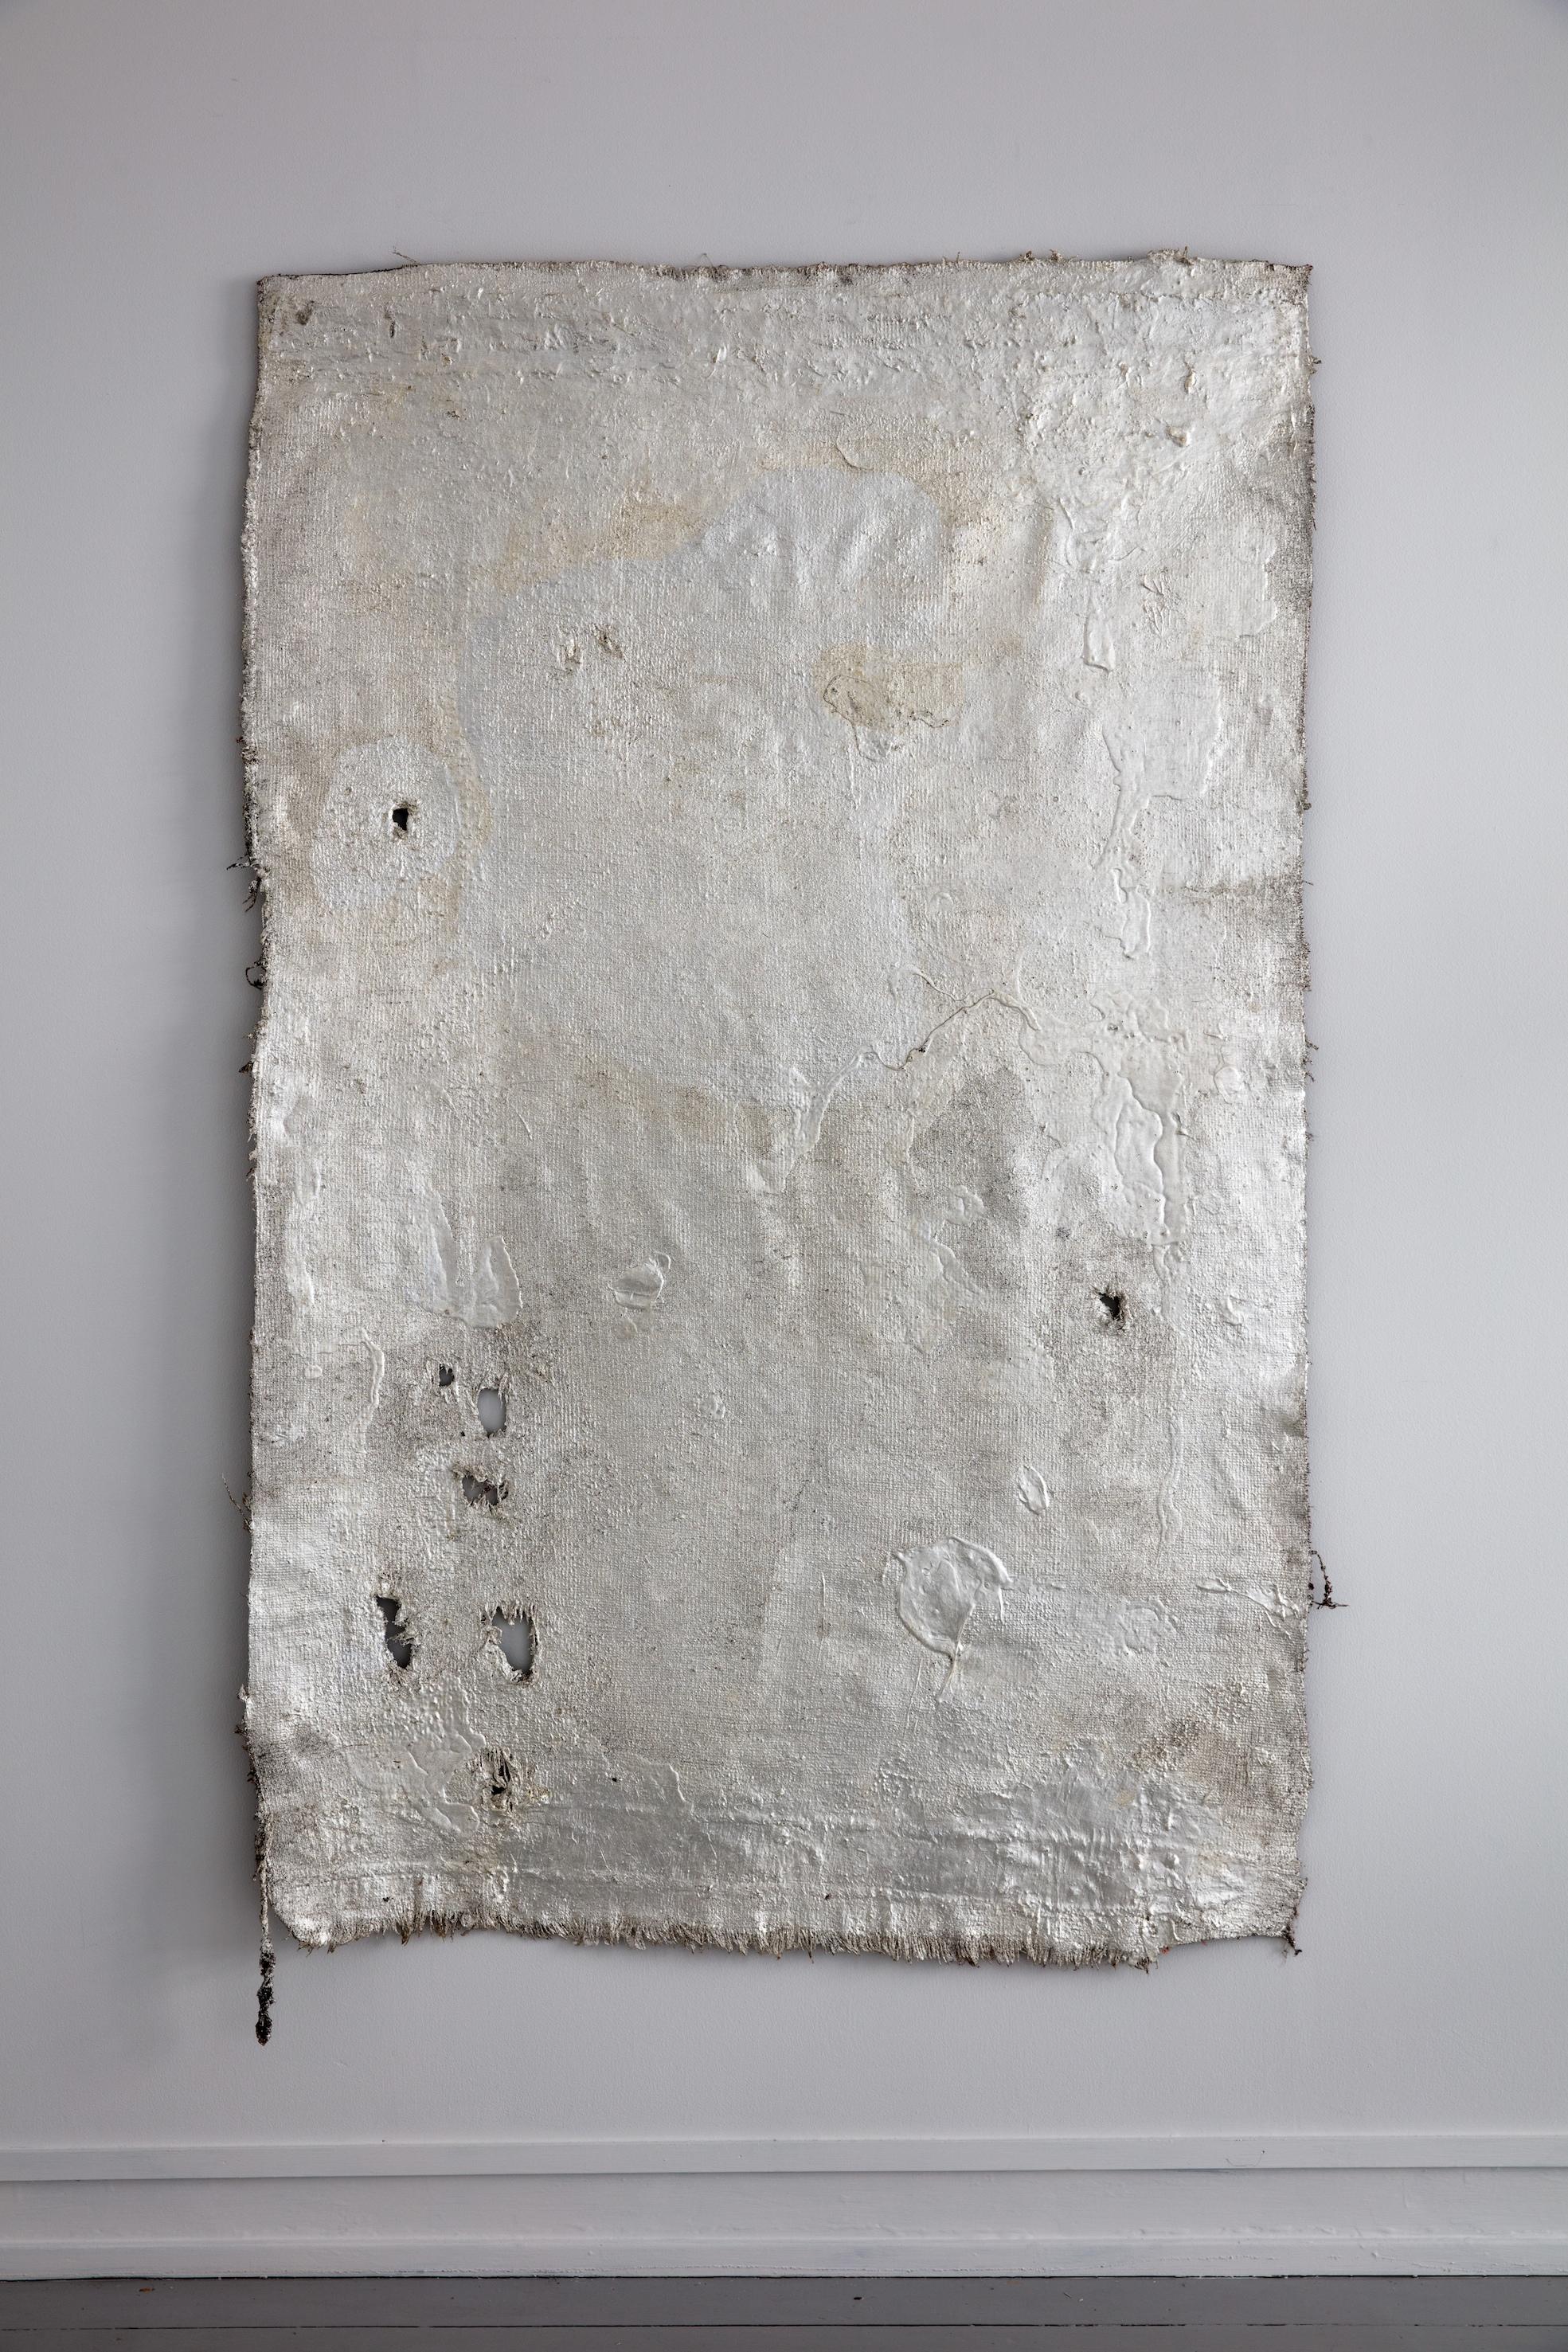 Iconostasis, 2017, Baluch rug, ruler, silverleaf, lacquer, 171 x 103 cm